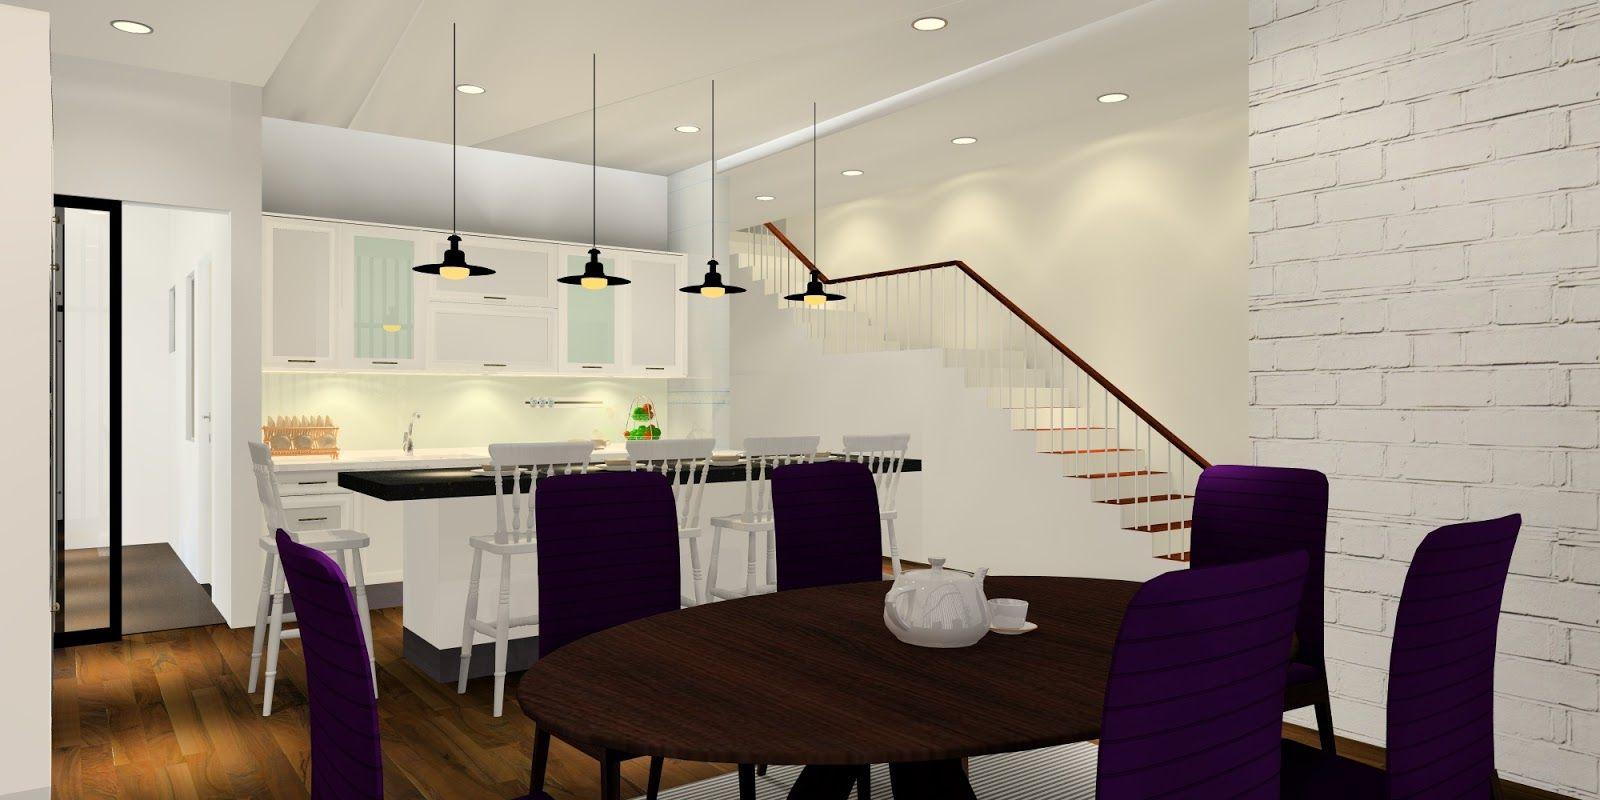 Meridian Interior Design - The Reed, Lake Fields, Sungai Besi Dry ...